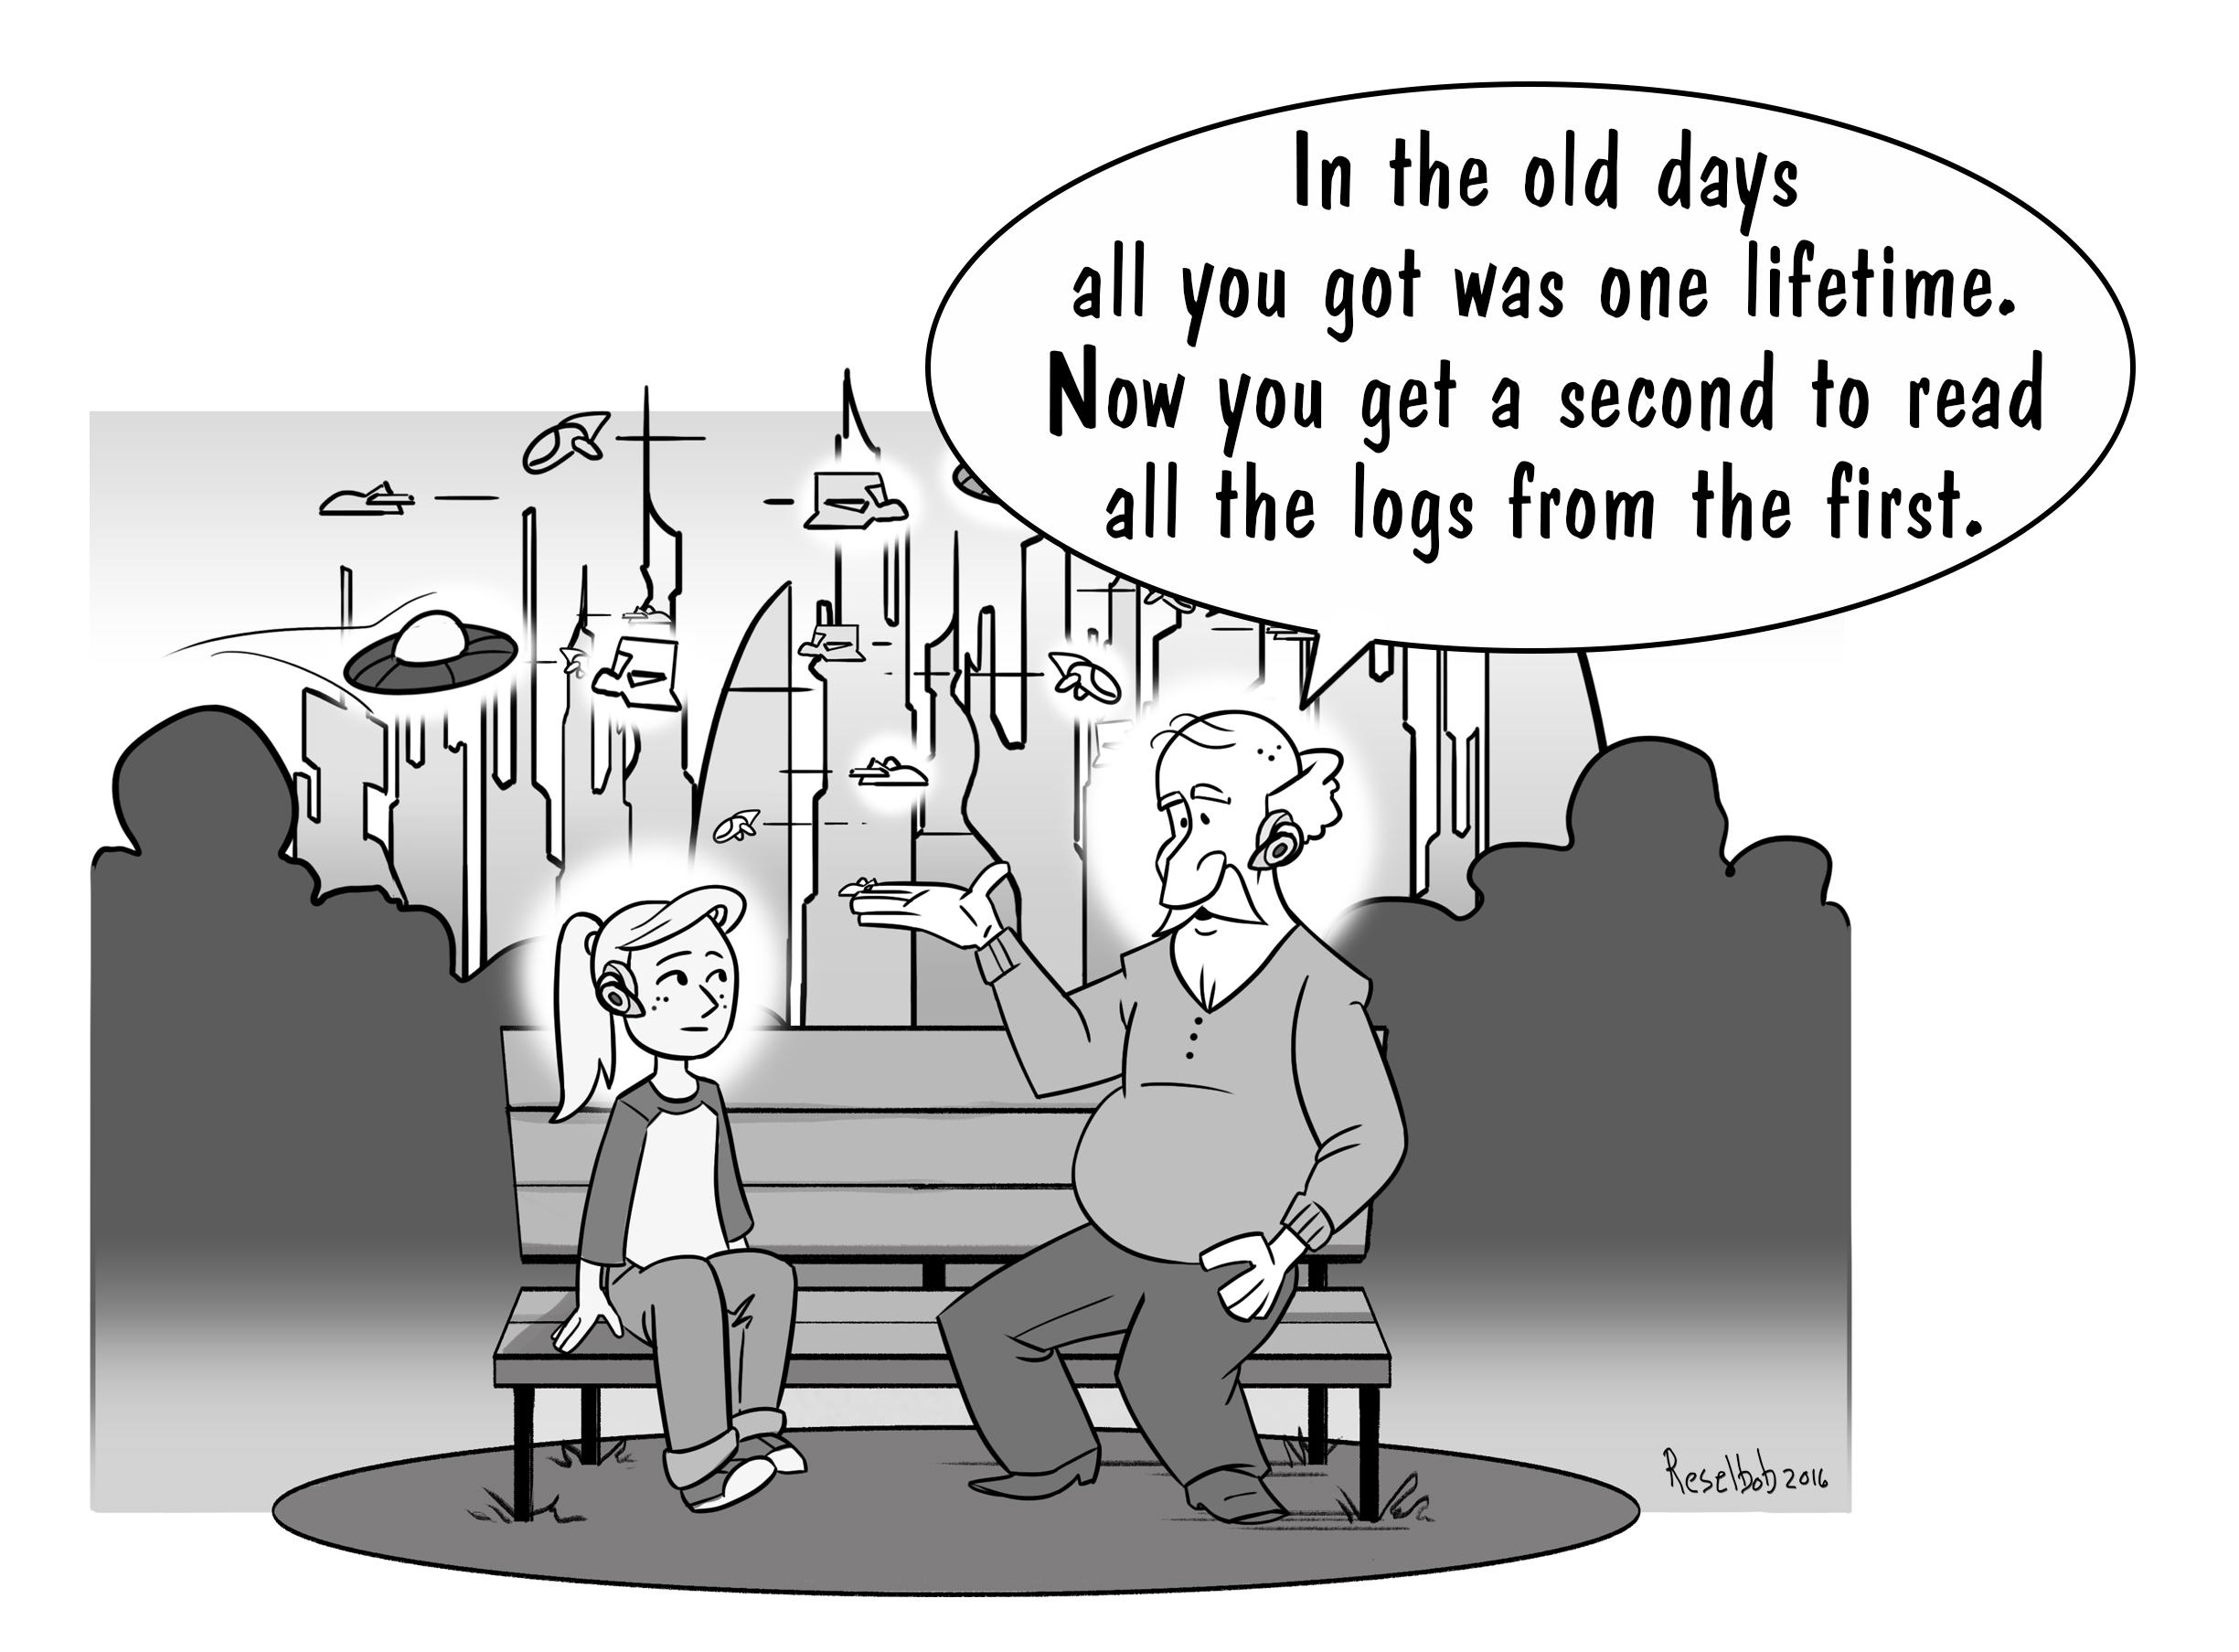 second-lifetime